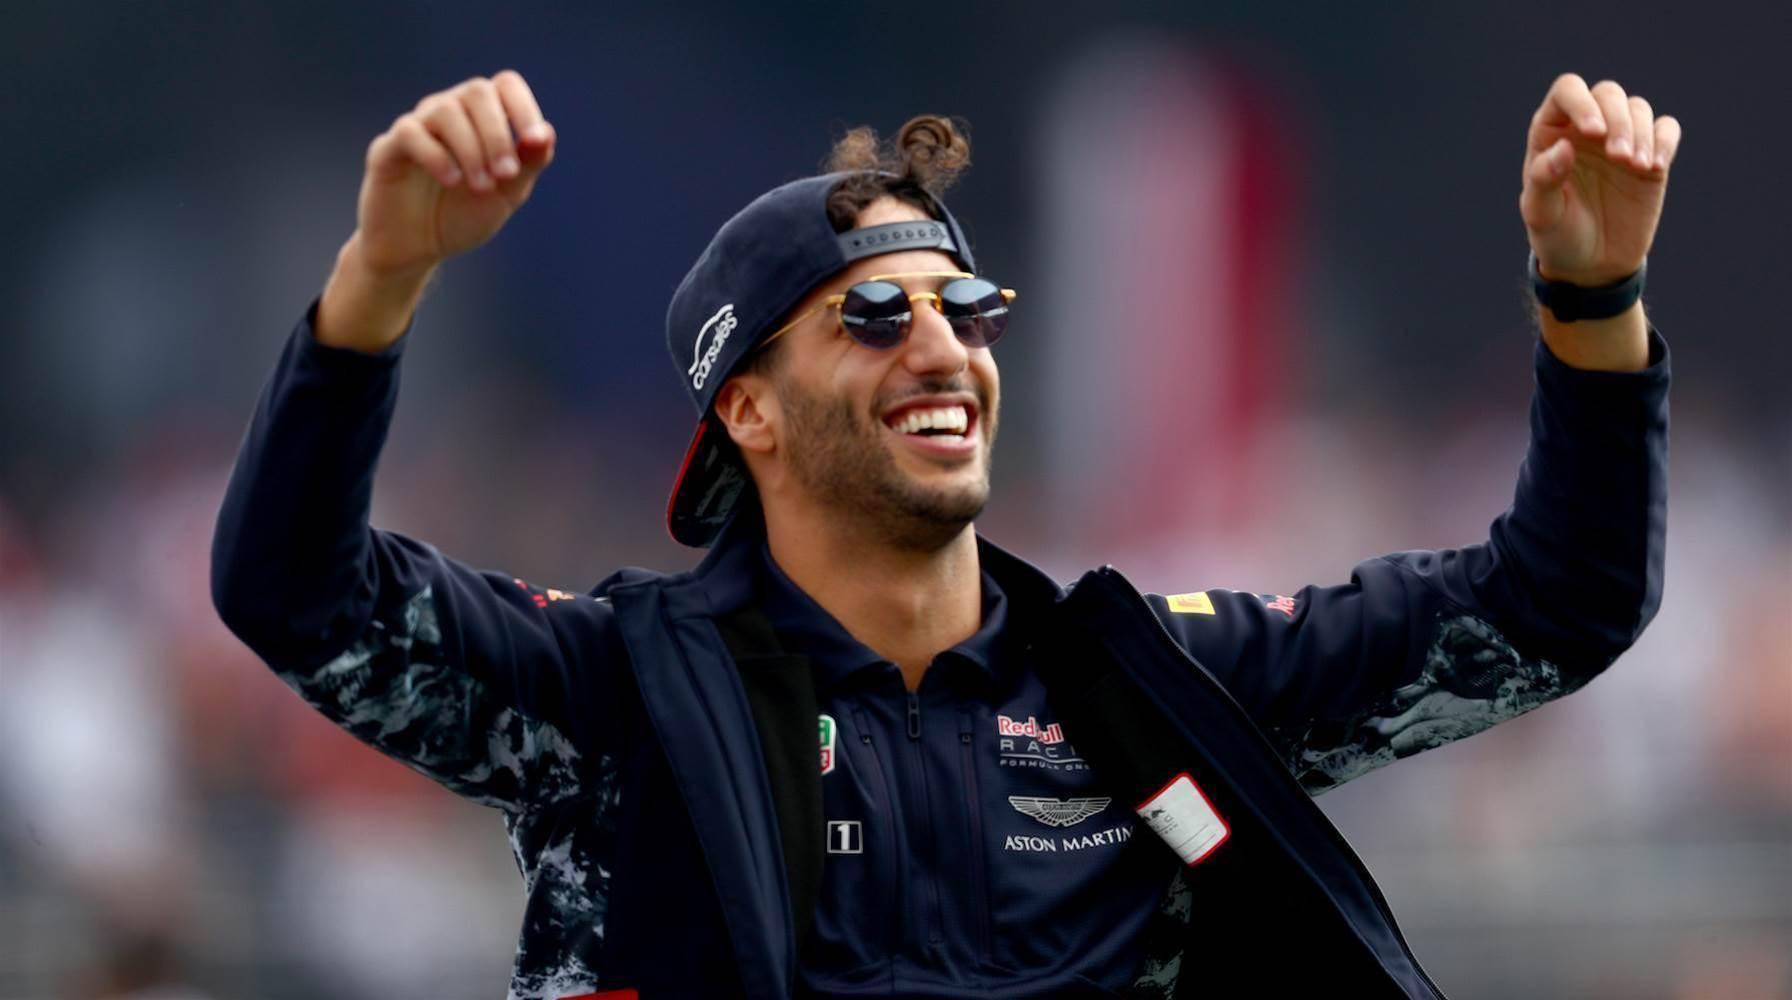 Red Bull to give Ricciardo time to decide future